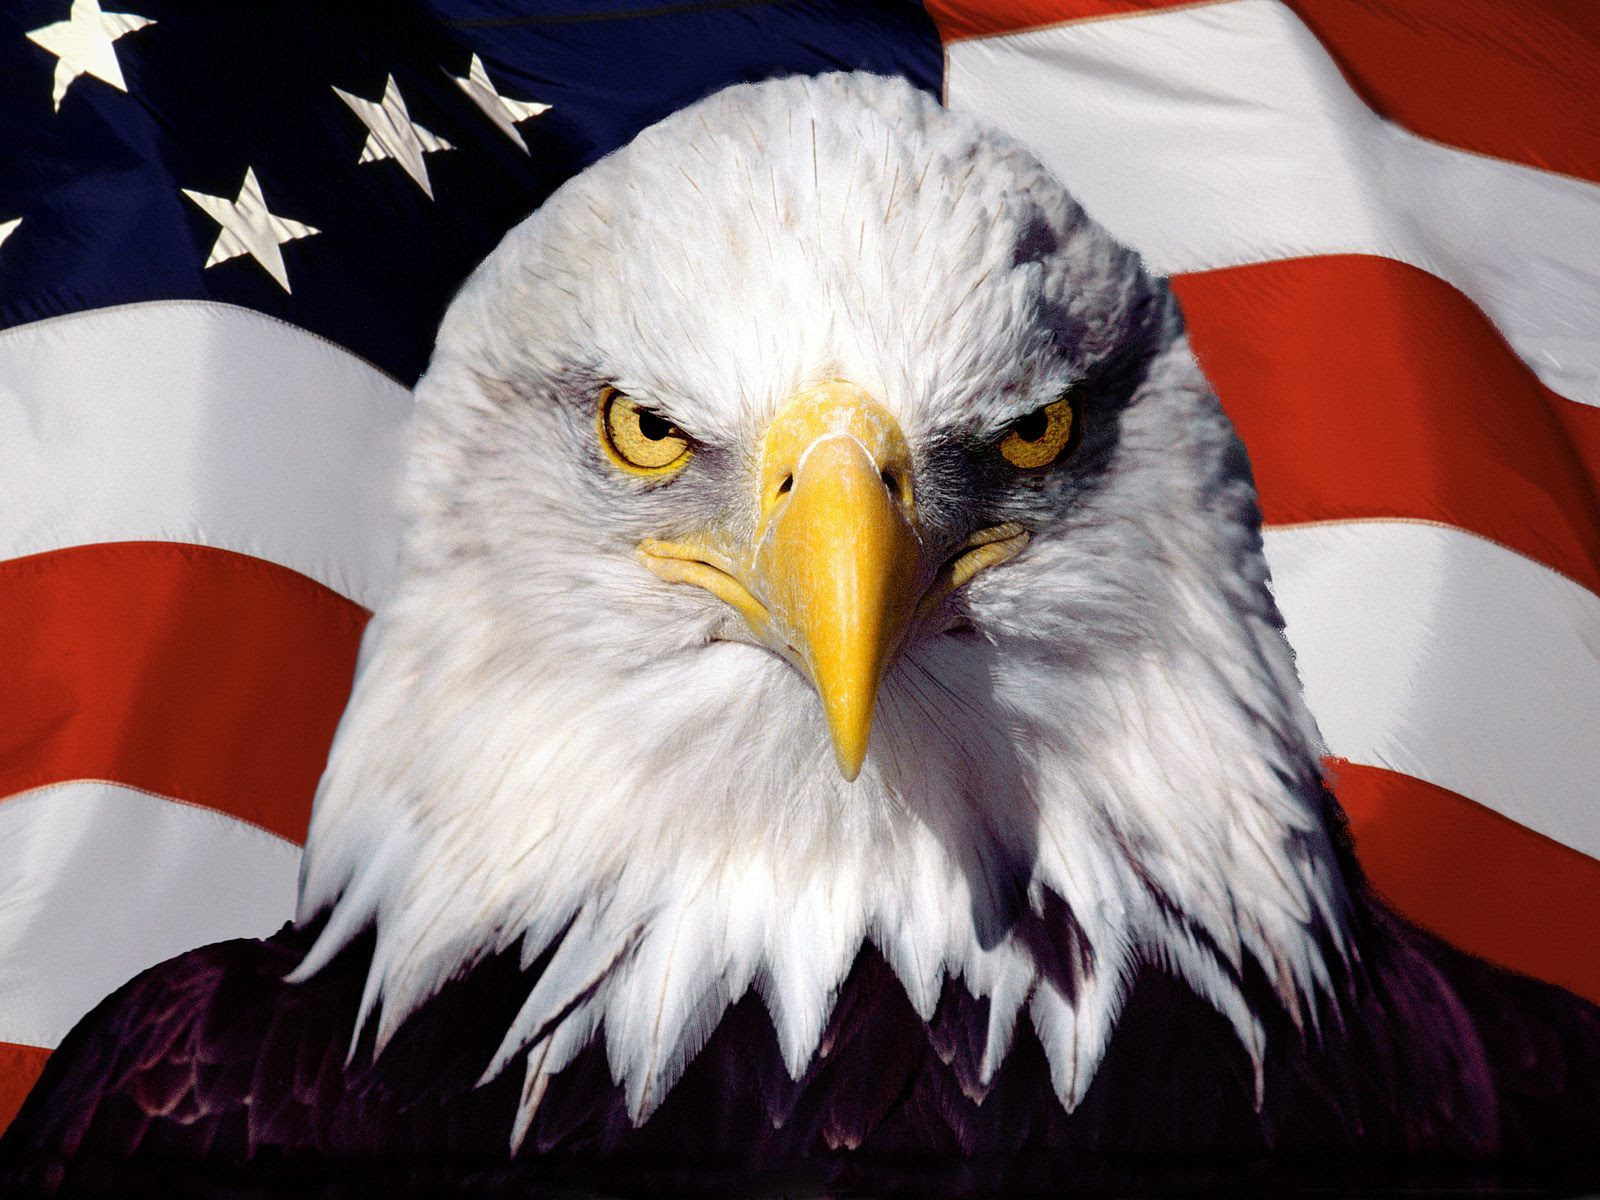 American flag with bald eagle overlay